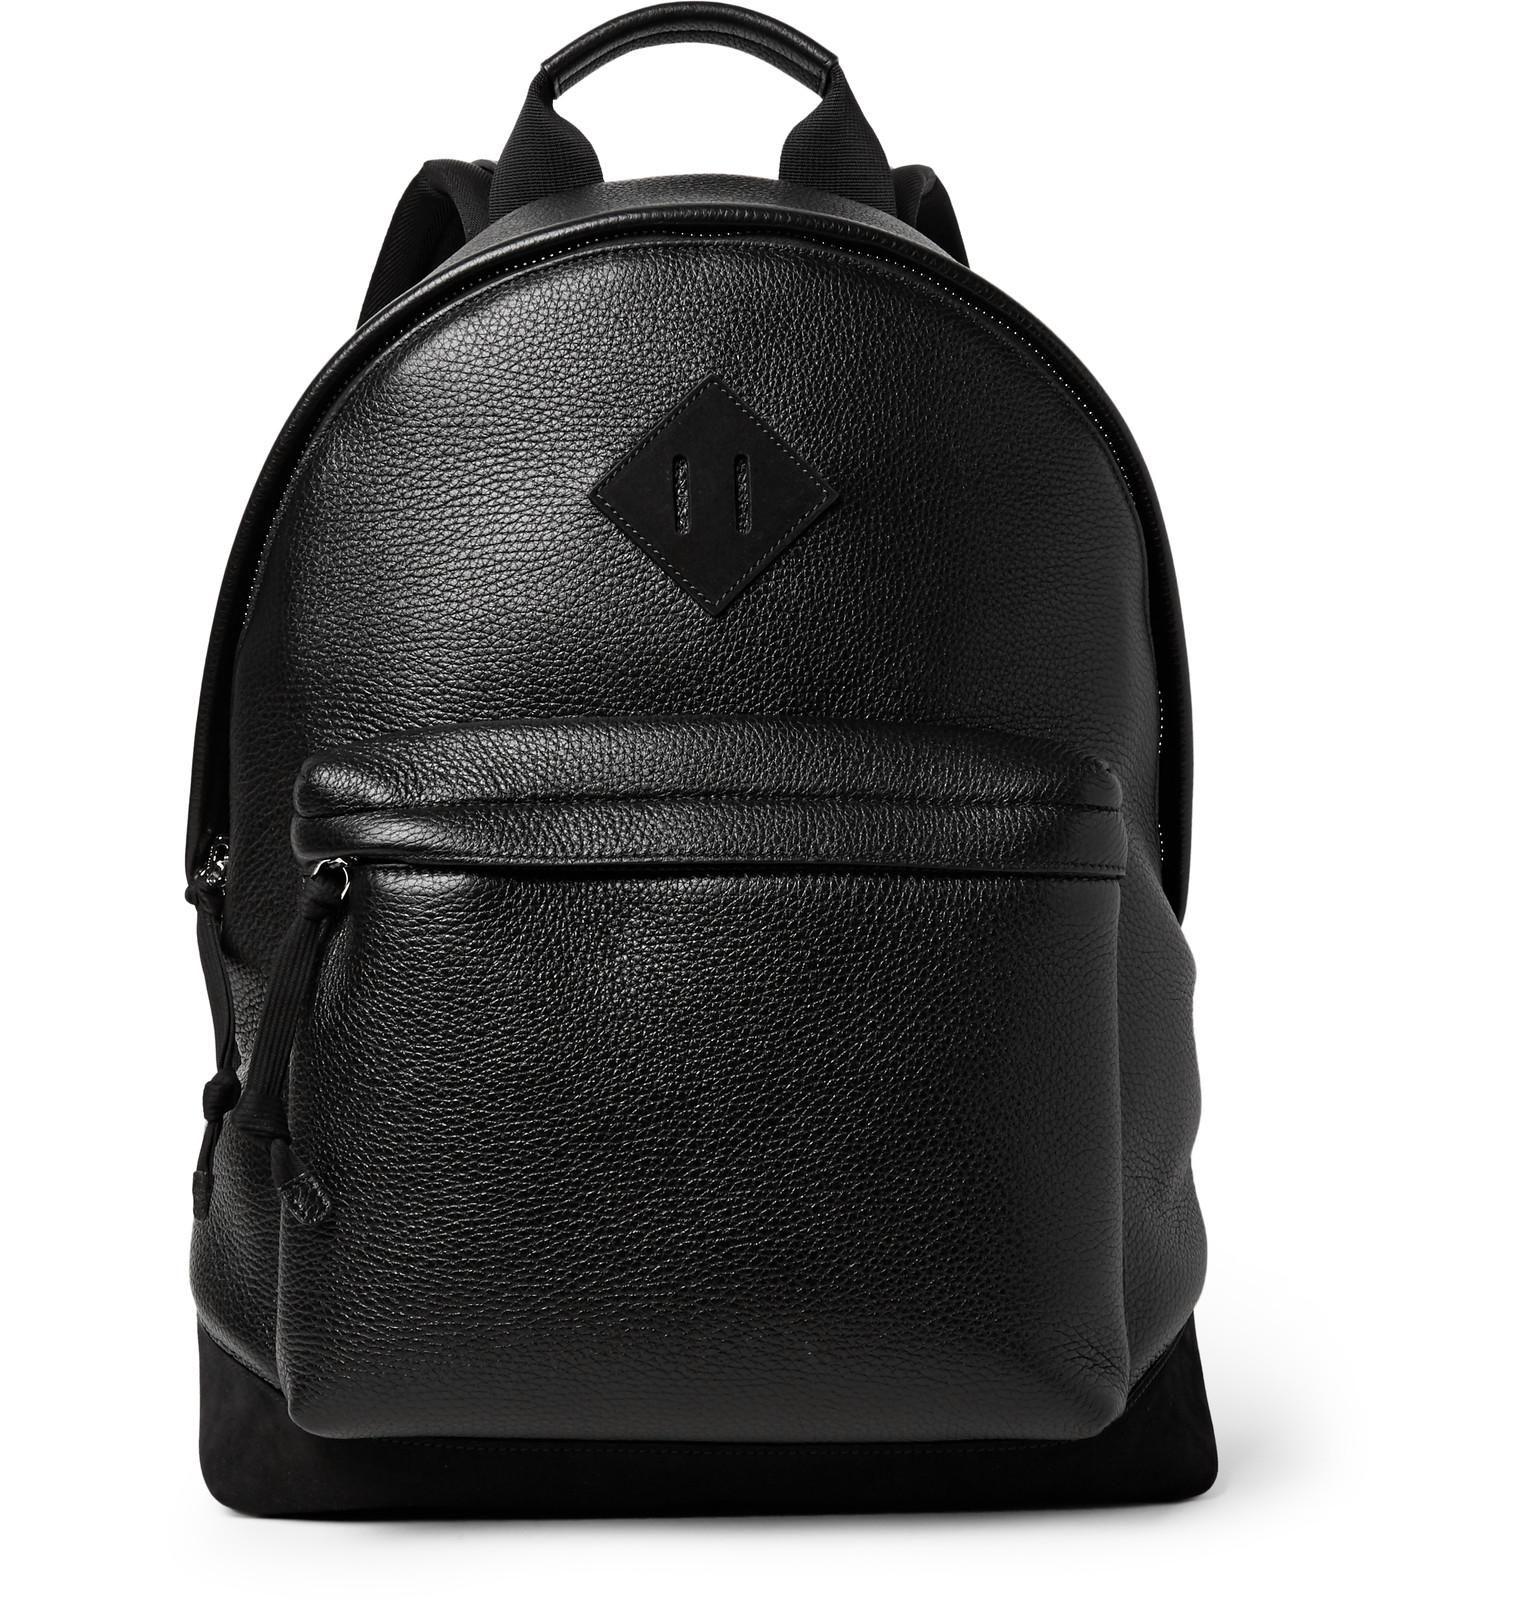 Full-grain Leather Backpack Tom Ford zqbhvefJT1